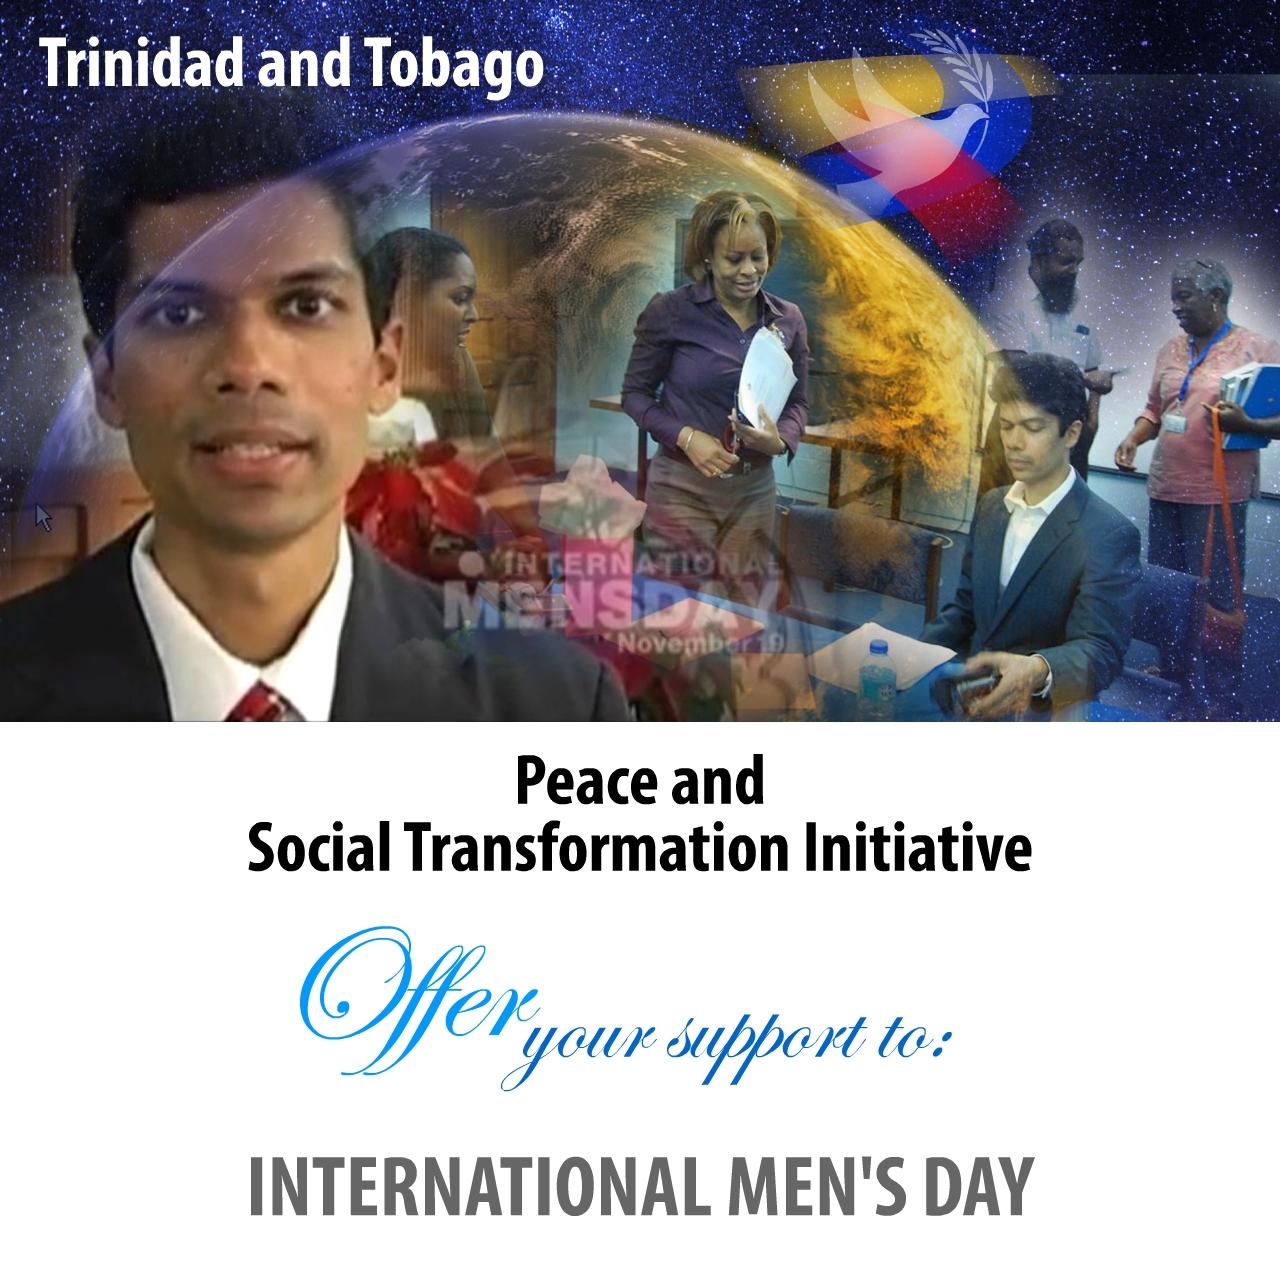 international-men-s-day-ppp-2018-en